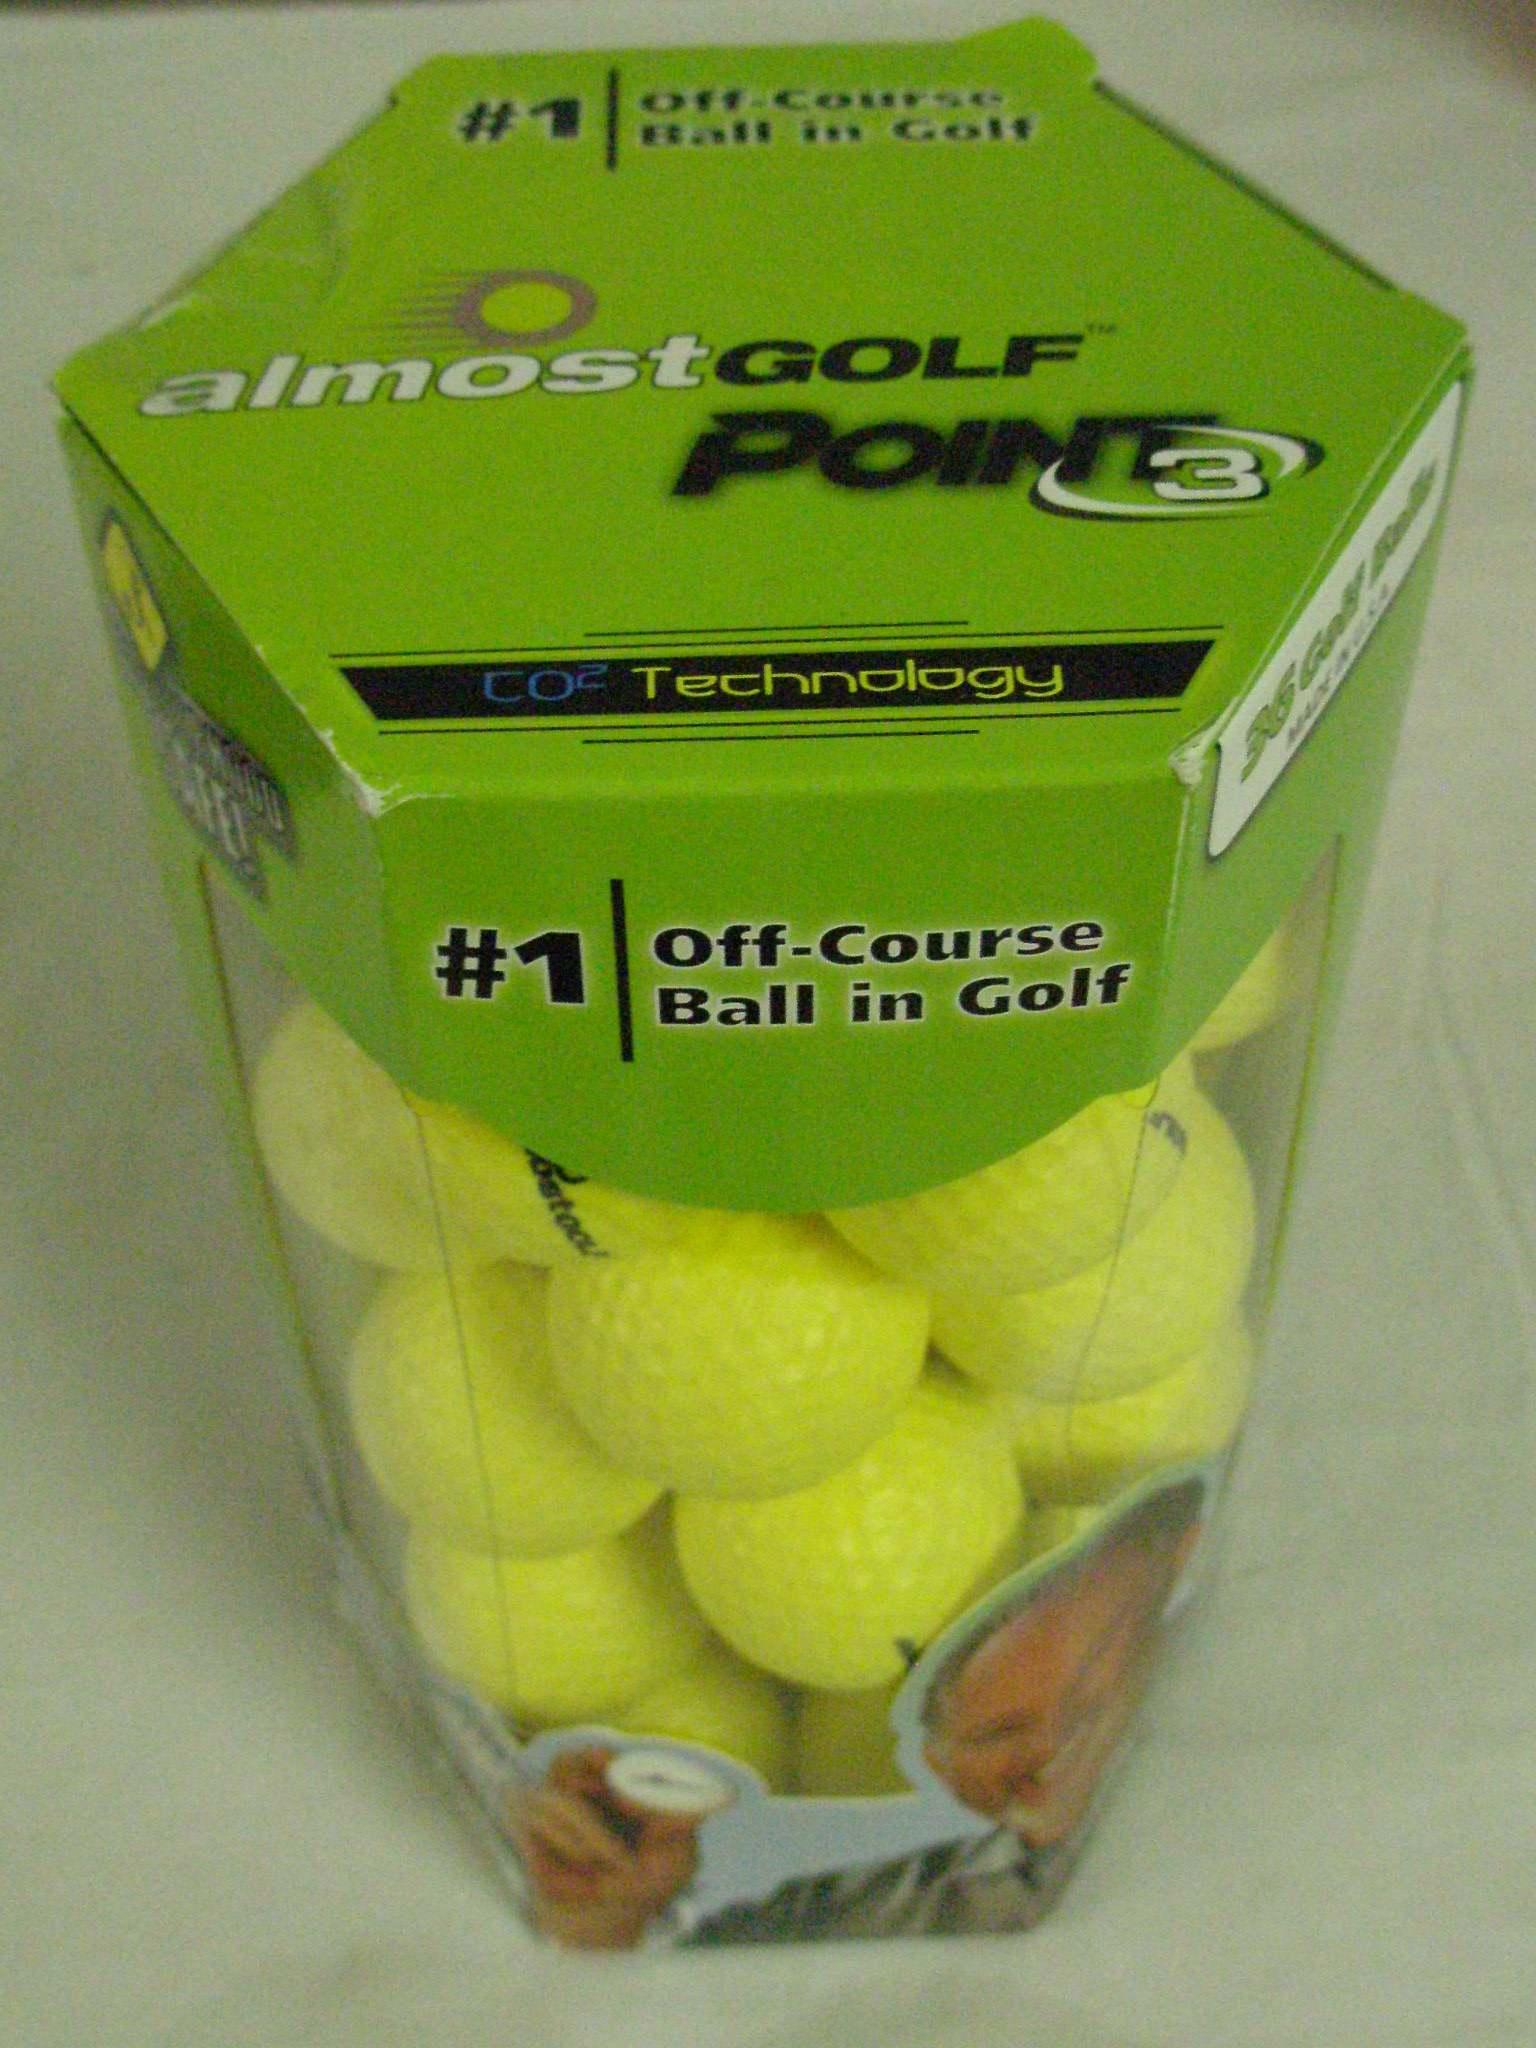 3 golf balls almost - 5 6